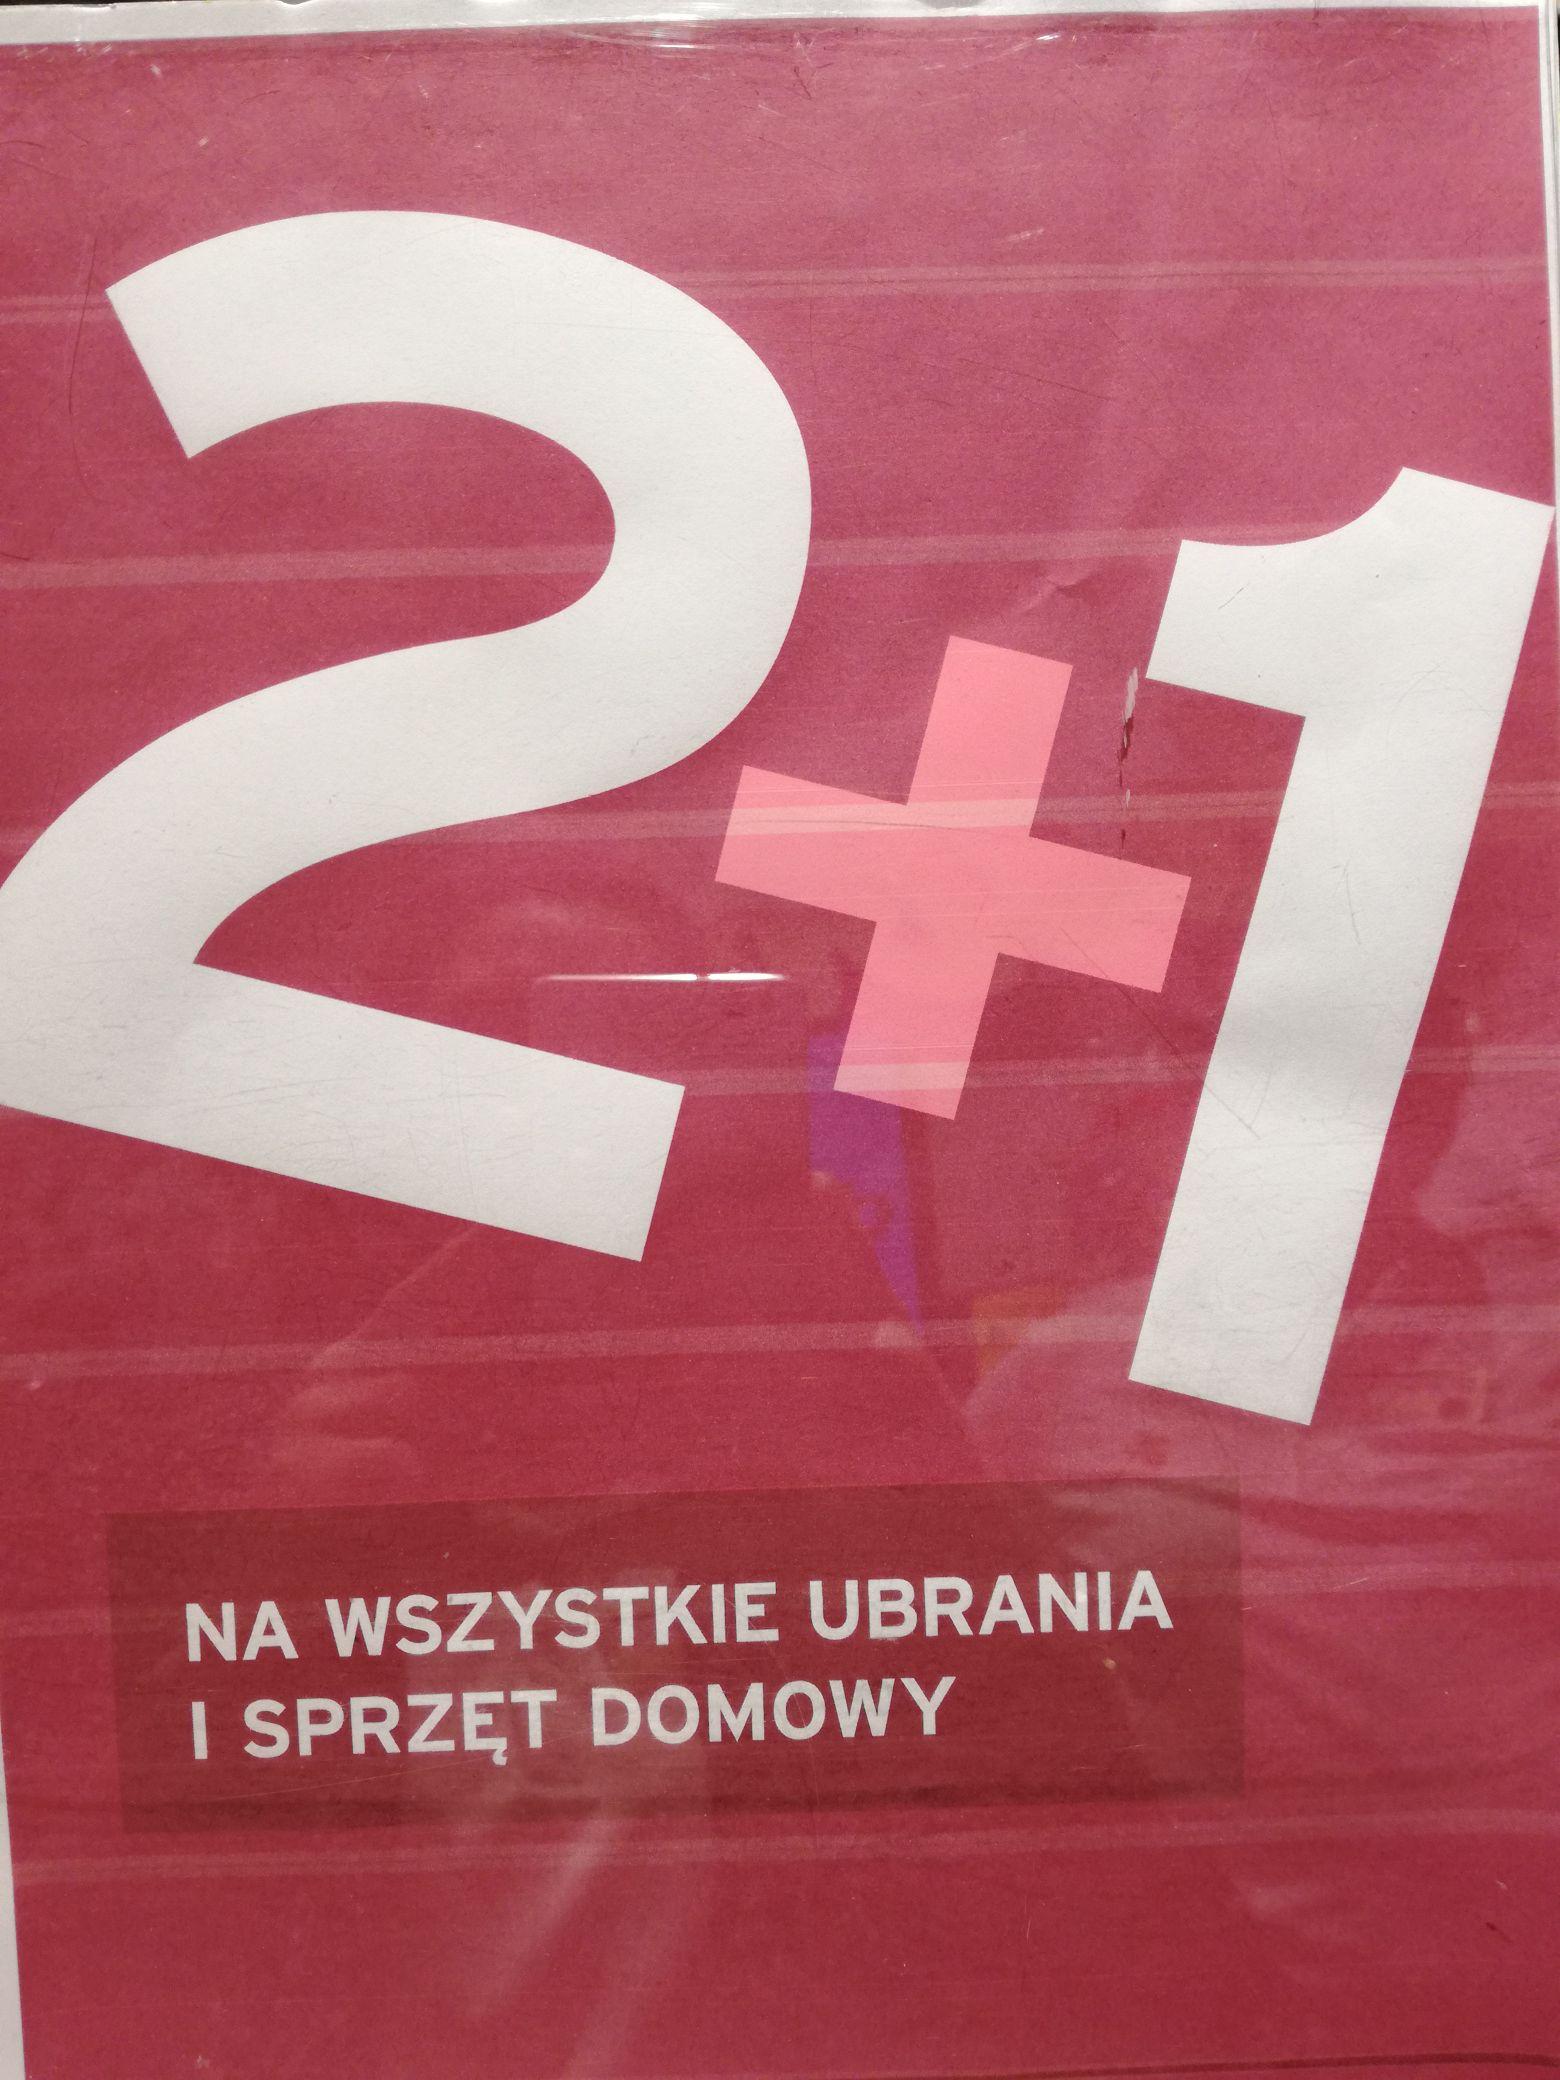 2 +1 Tchibo C.H Serenada Kraków!!!